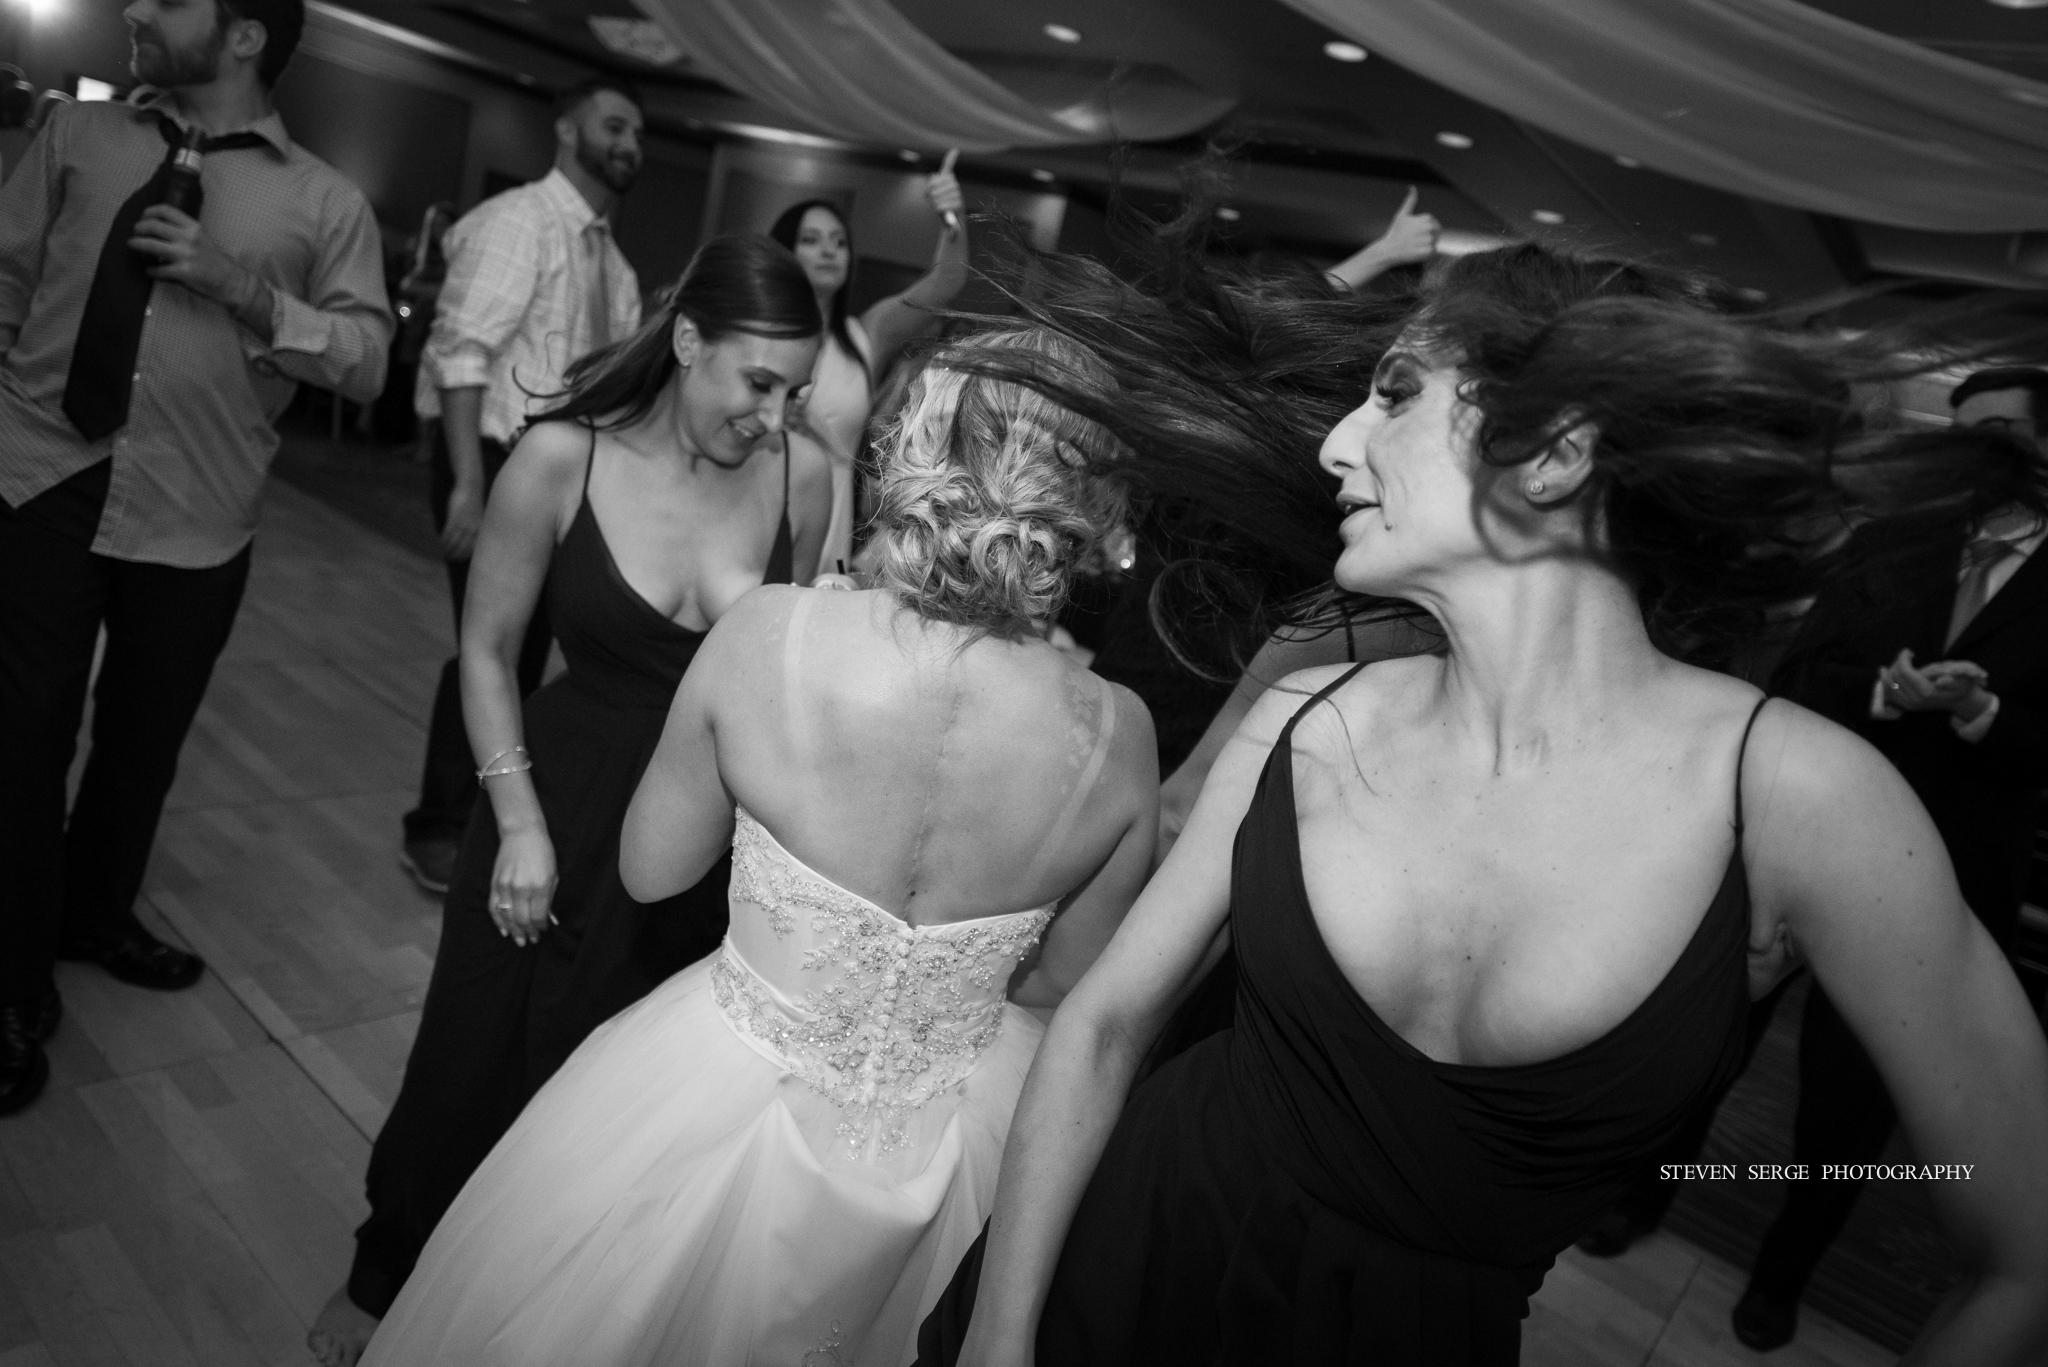 scranton-wedding-photographers-hilton-steven-serge-photography-28.jpg